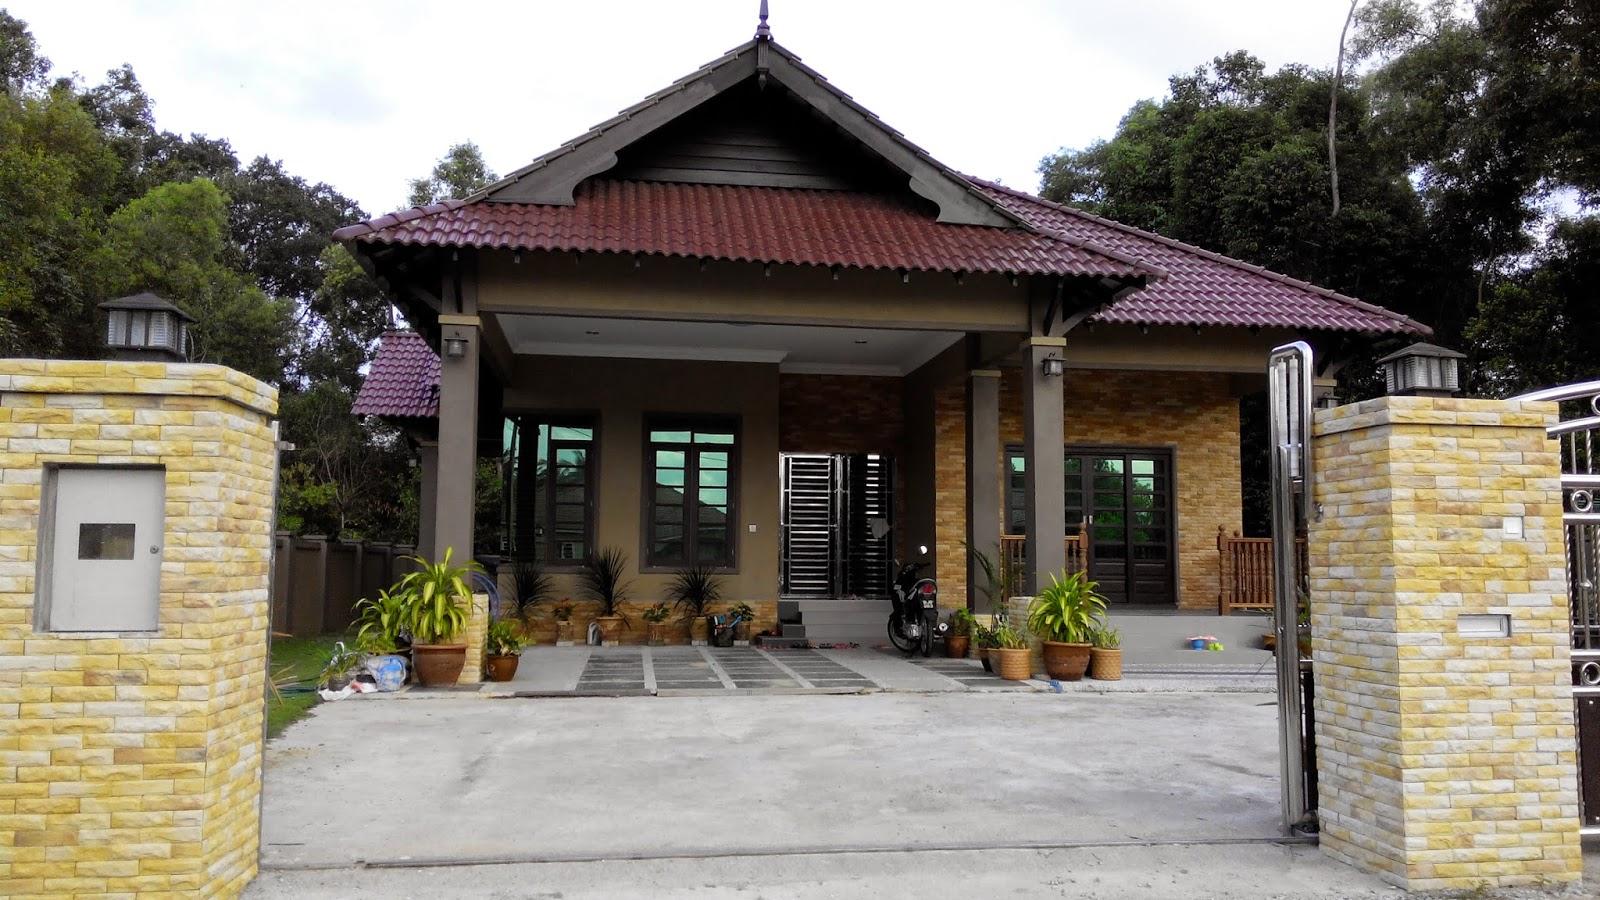 Pasang Tiles Porch Mozek Lantai Luar Rumah Desainrumahid